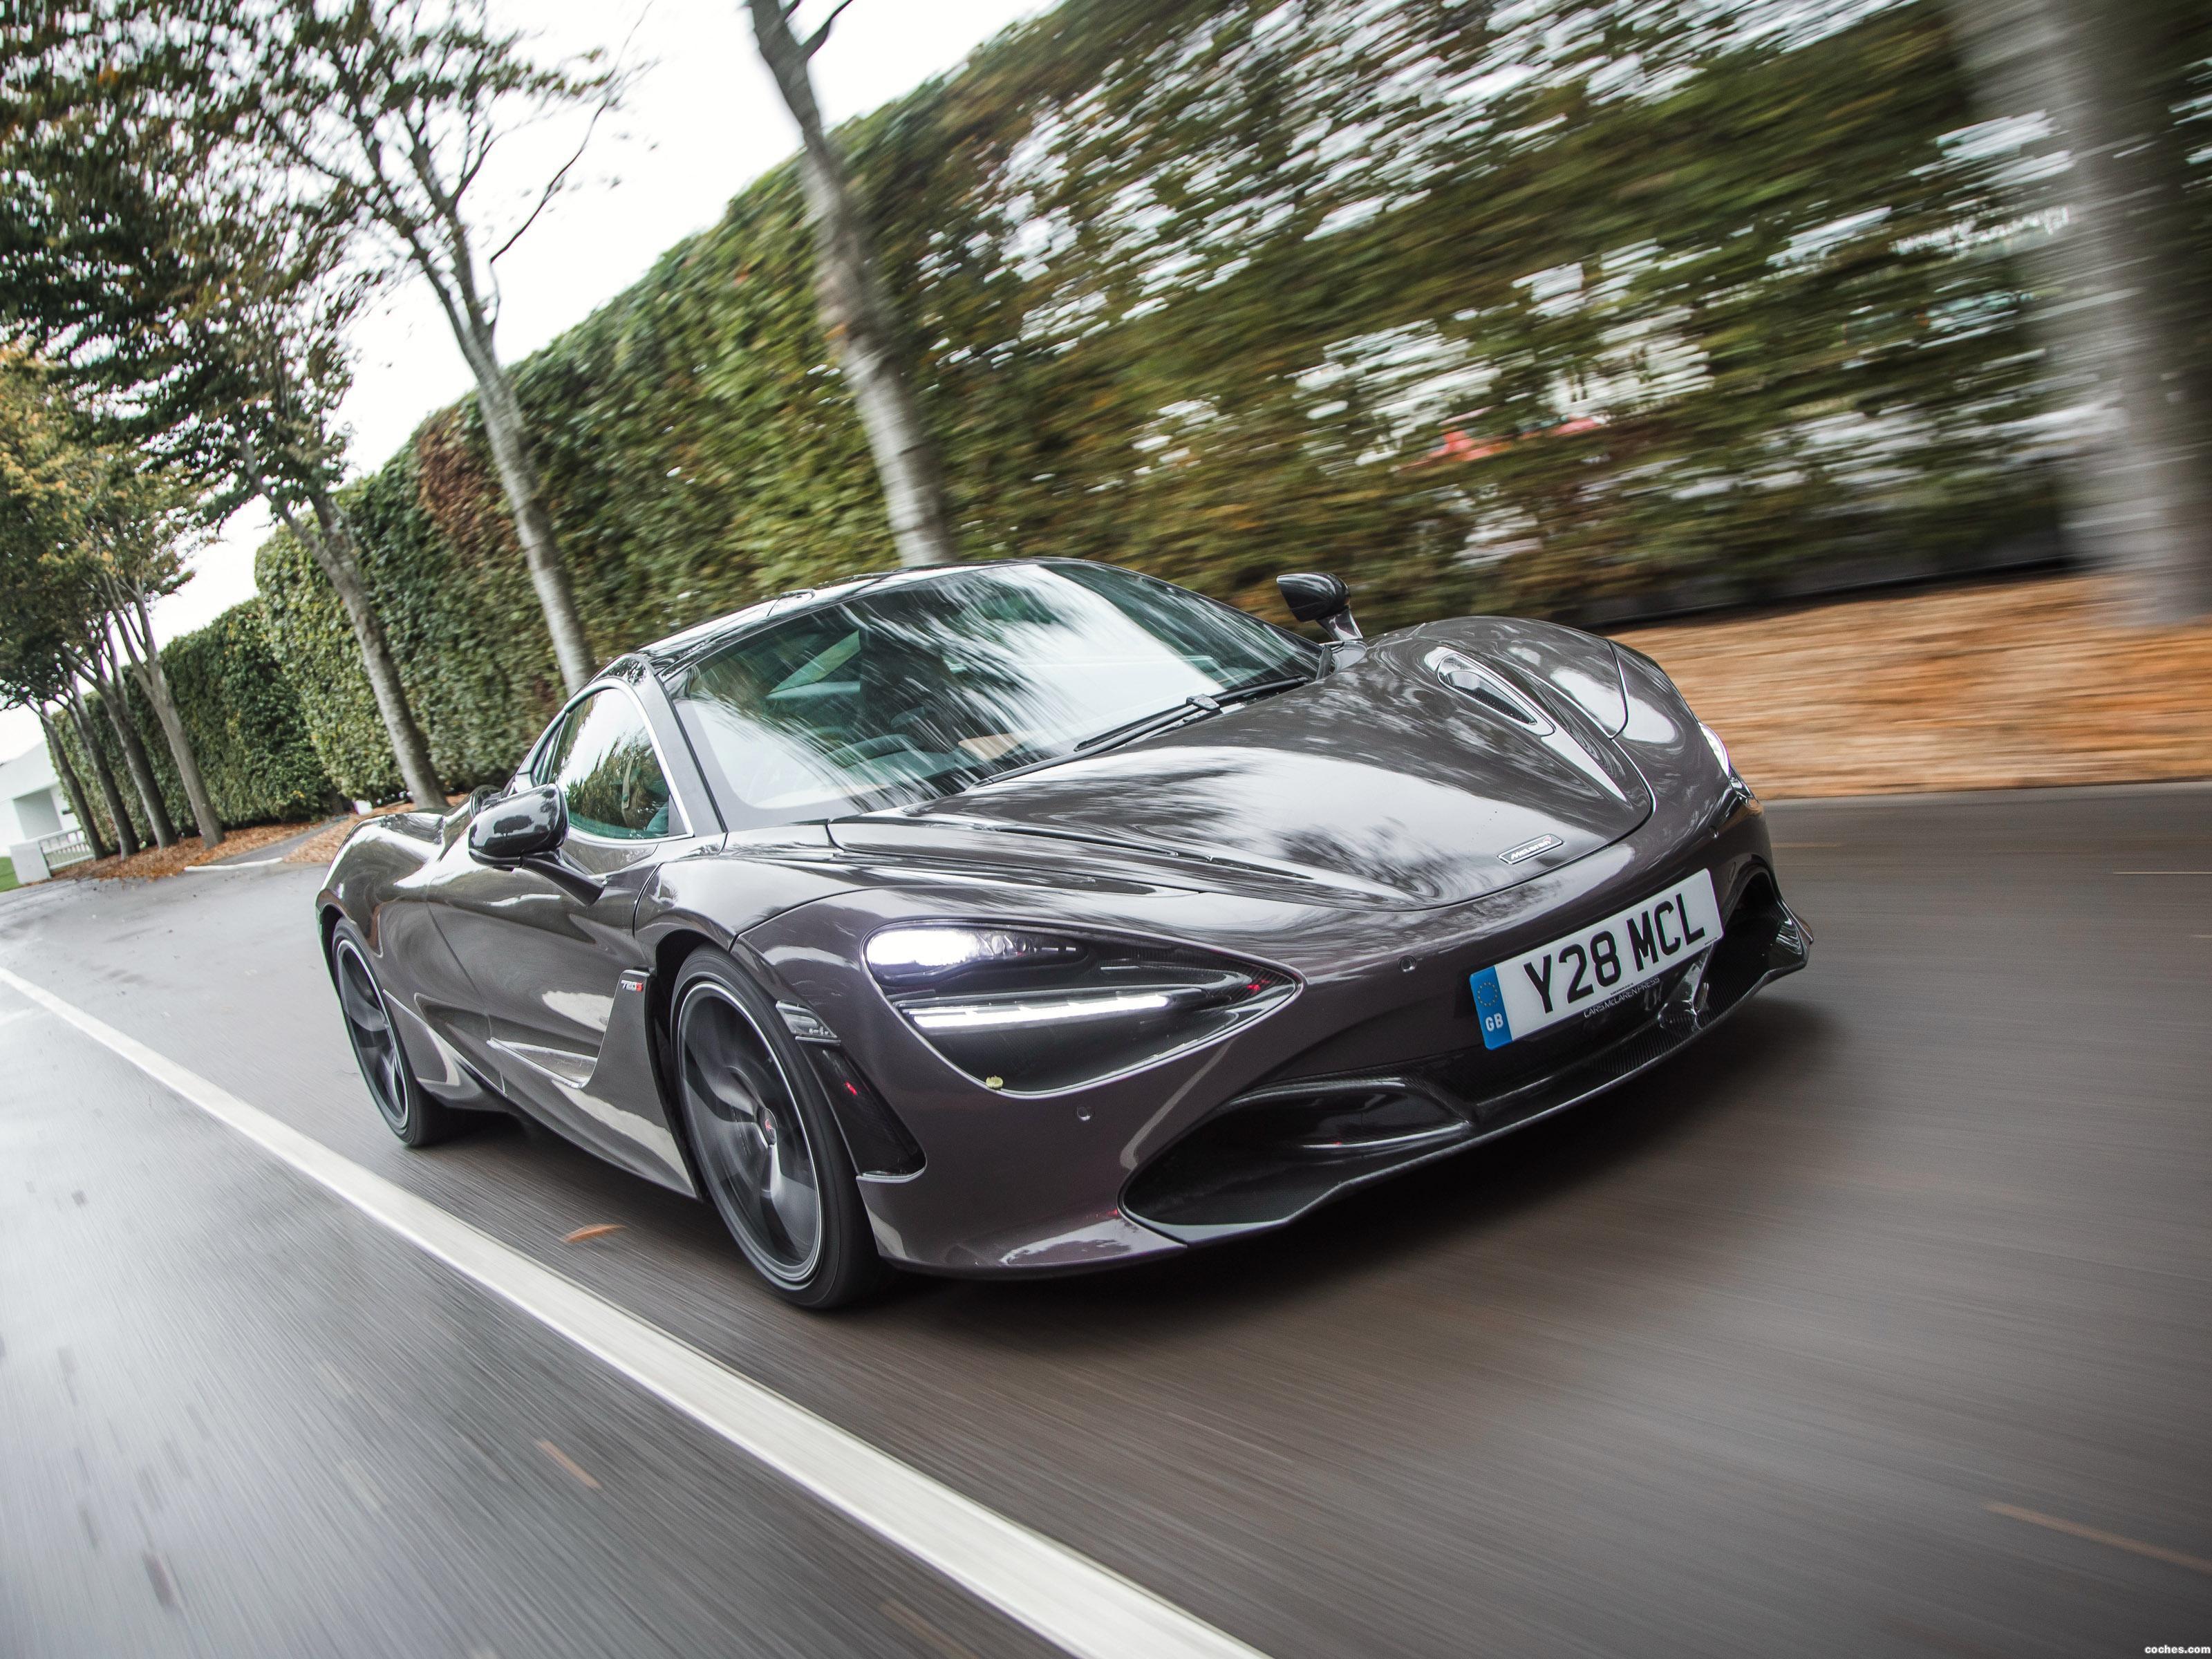 mclaren_720s-coupe-launch-edition-uk-2017_r29.jpg